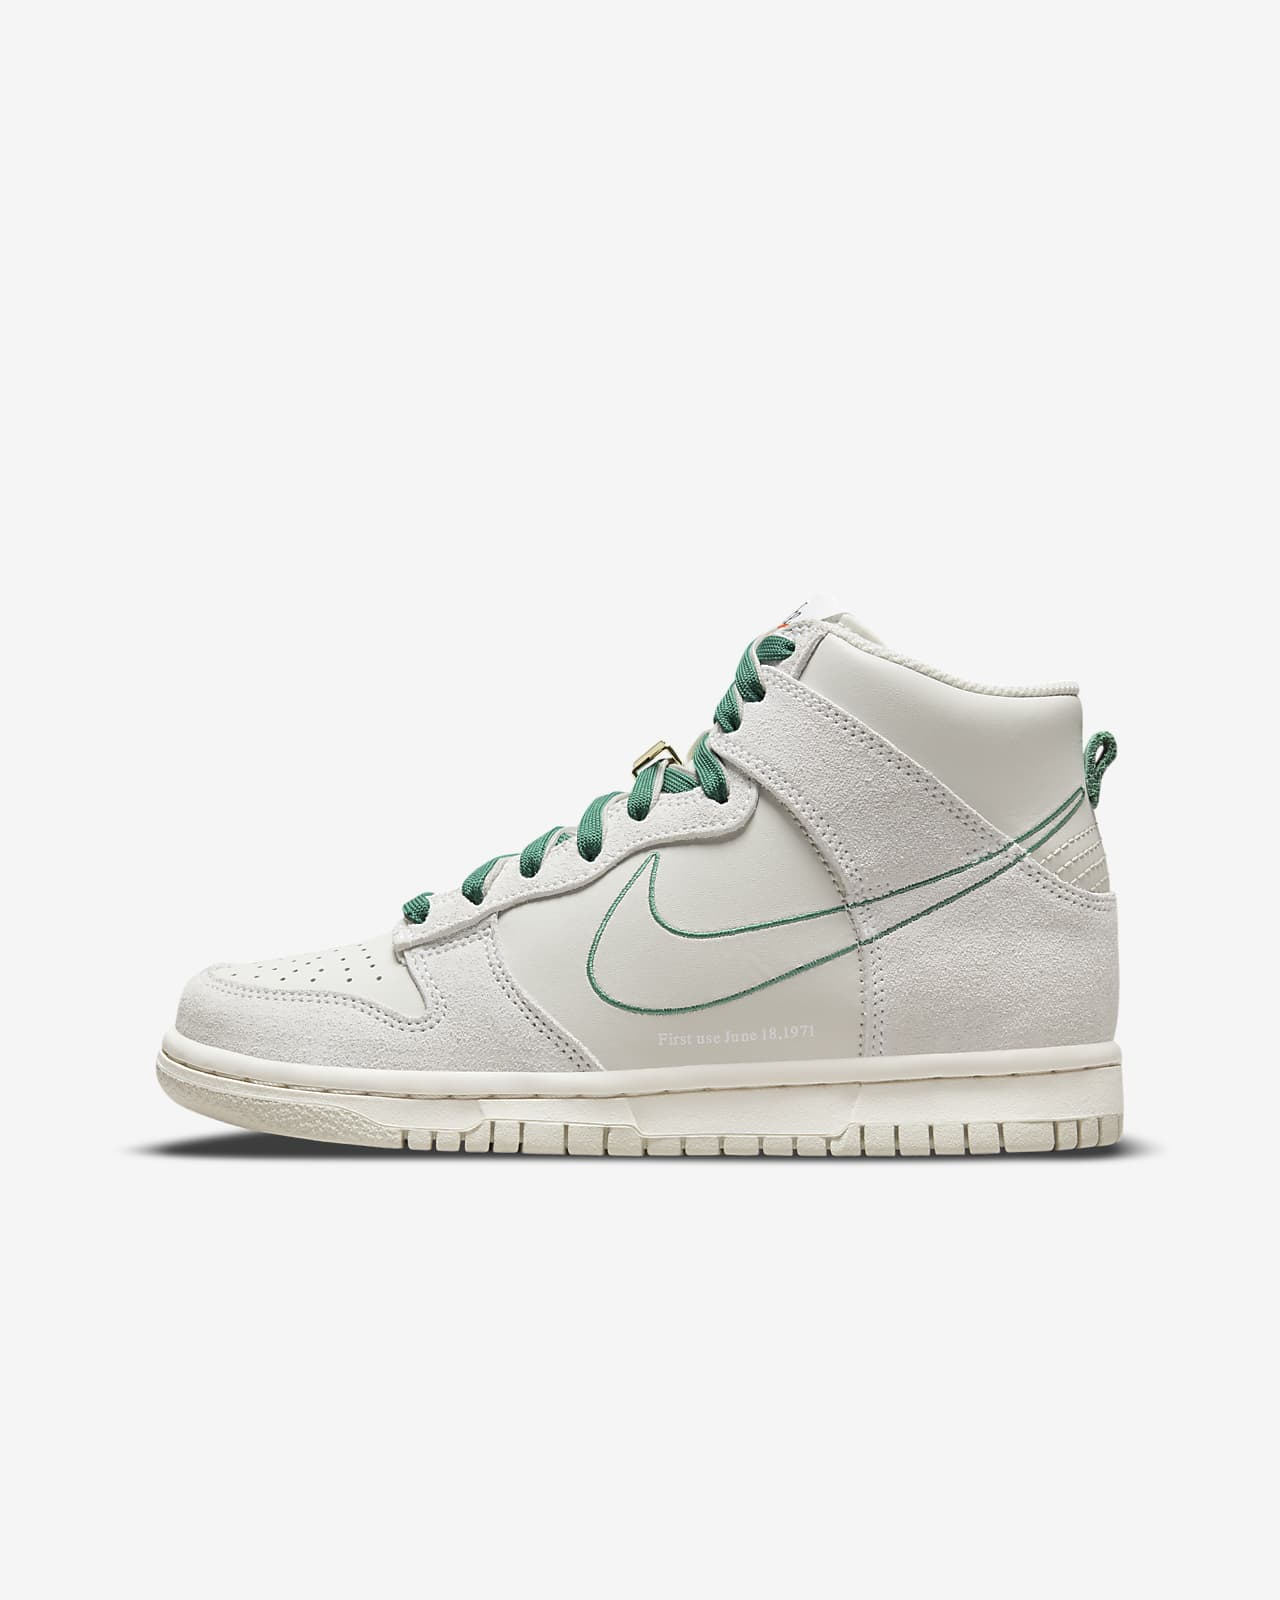 Nike Dunk HI SE (GS) 大童运动童鞋